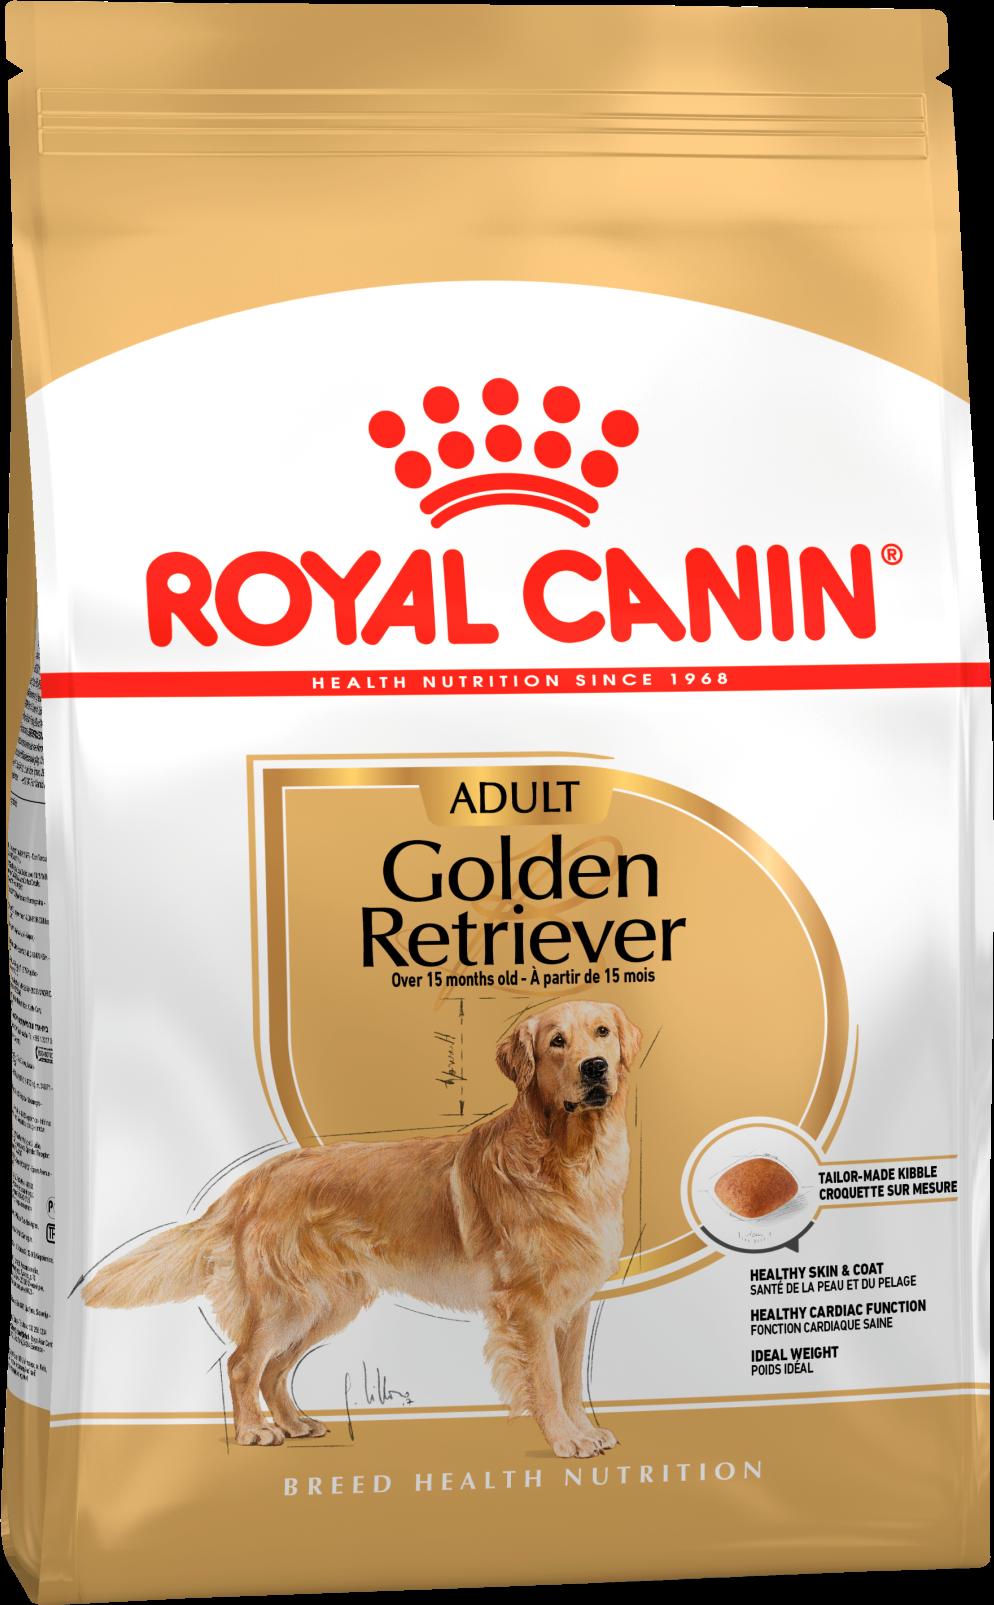 Royal Canin Корм для взрослых собак породы голден ретривер, Royal Canin Golden Retriever Adult 369030.png